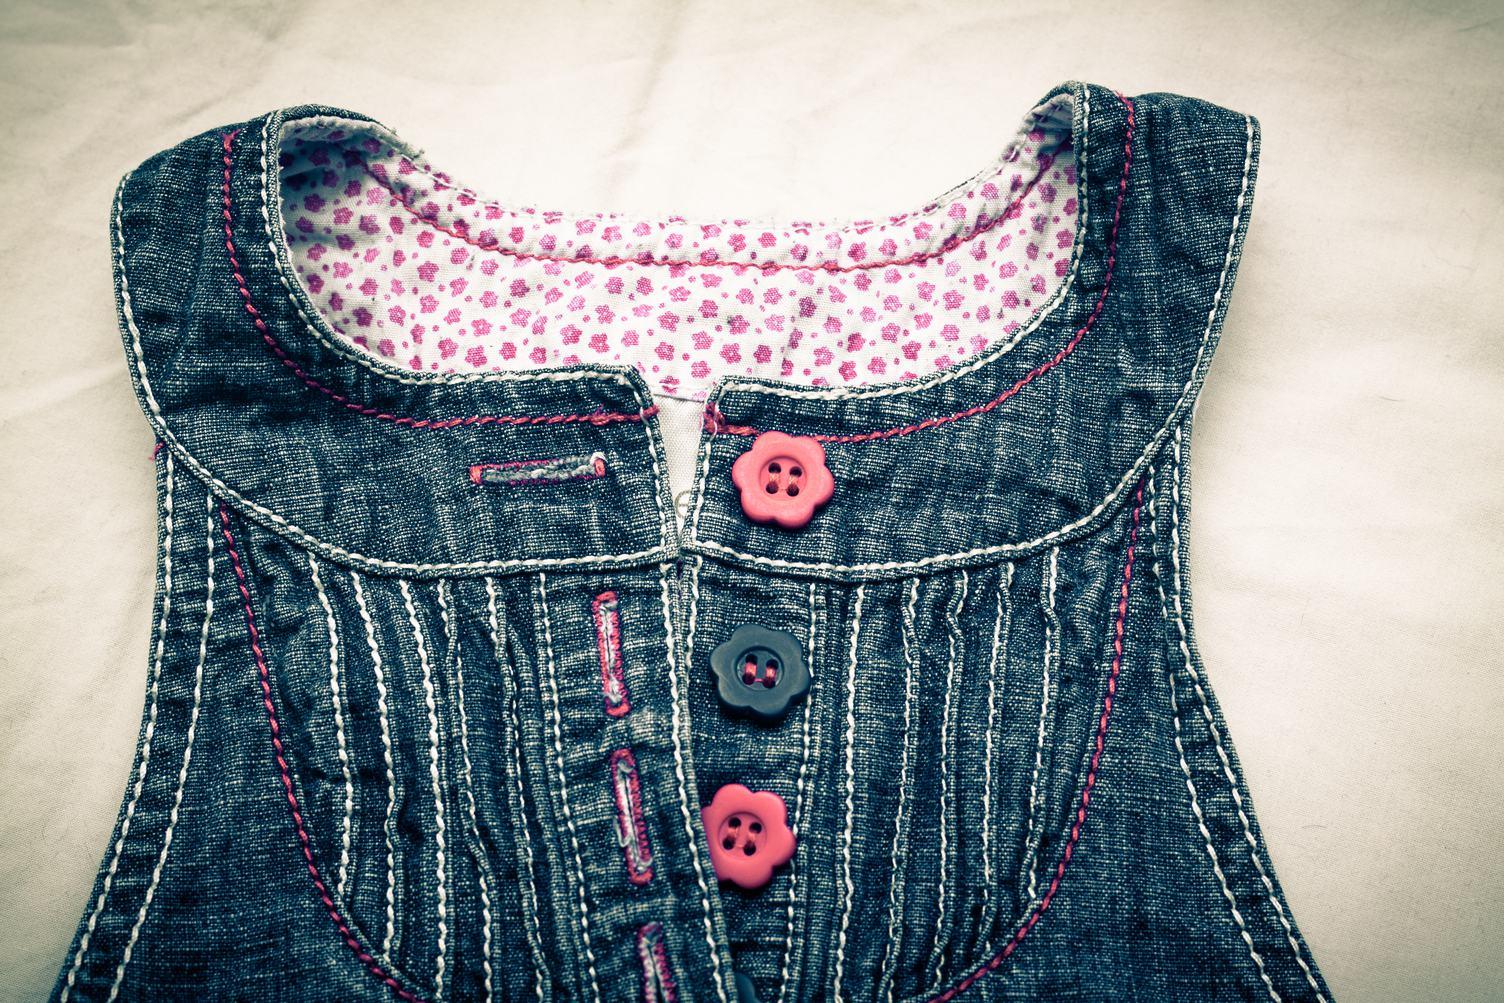 Baby Girl Jeans Dress Closeup